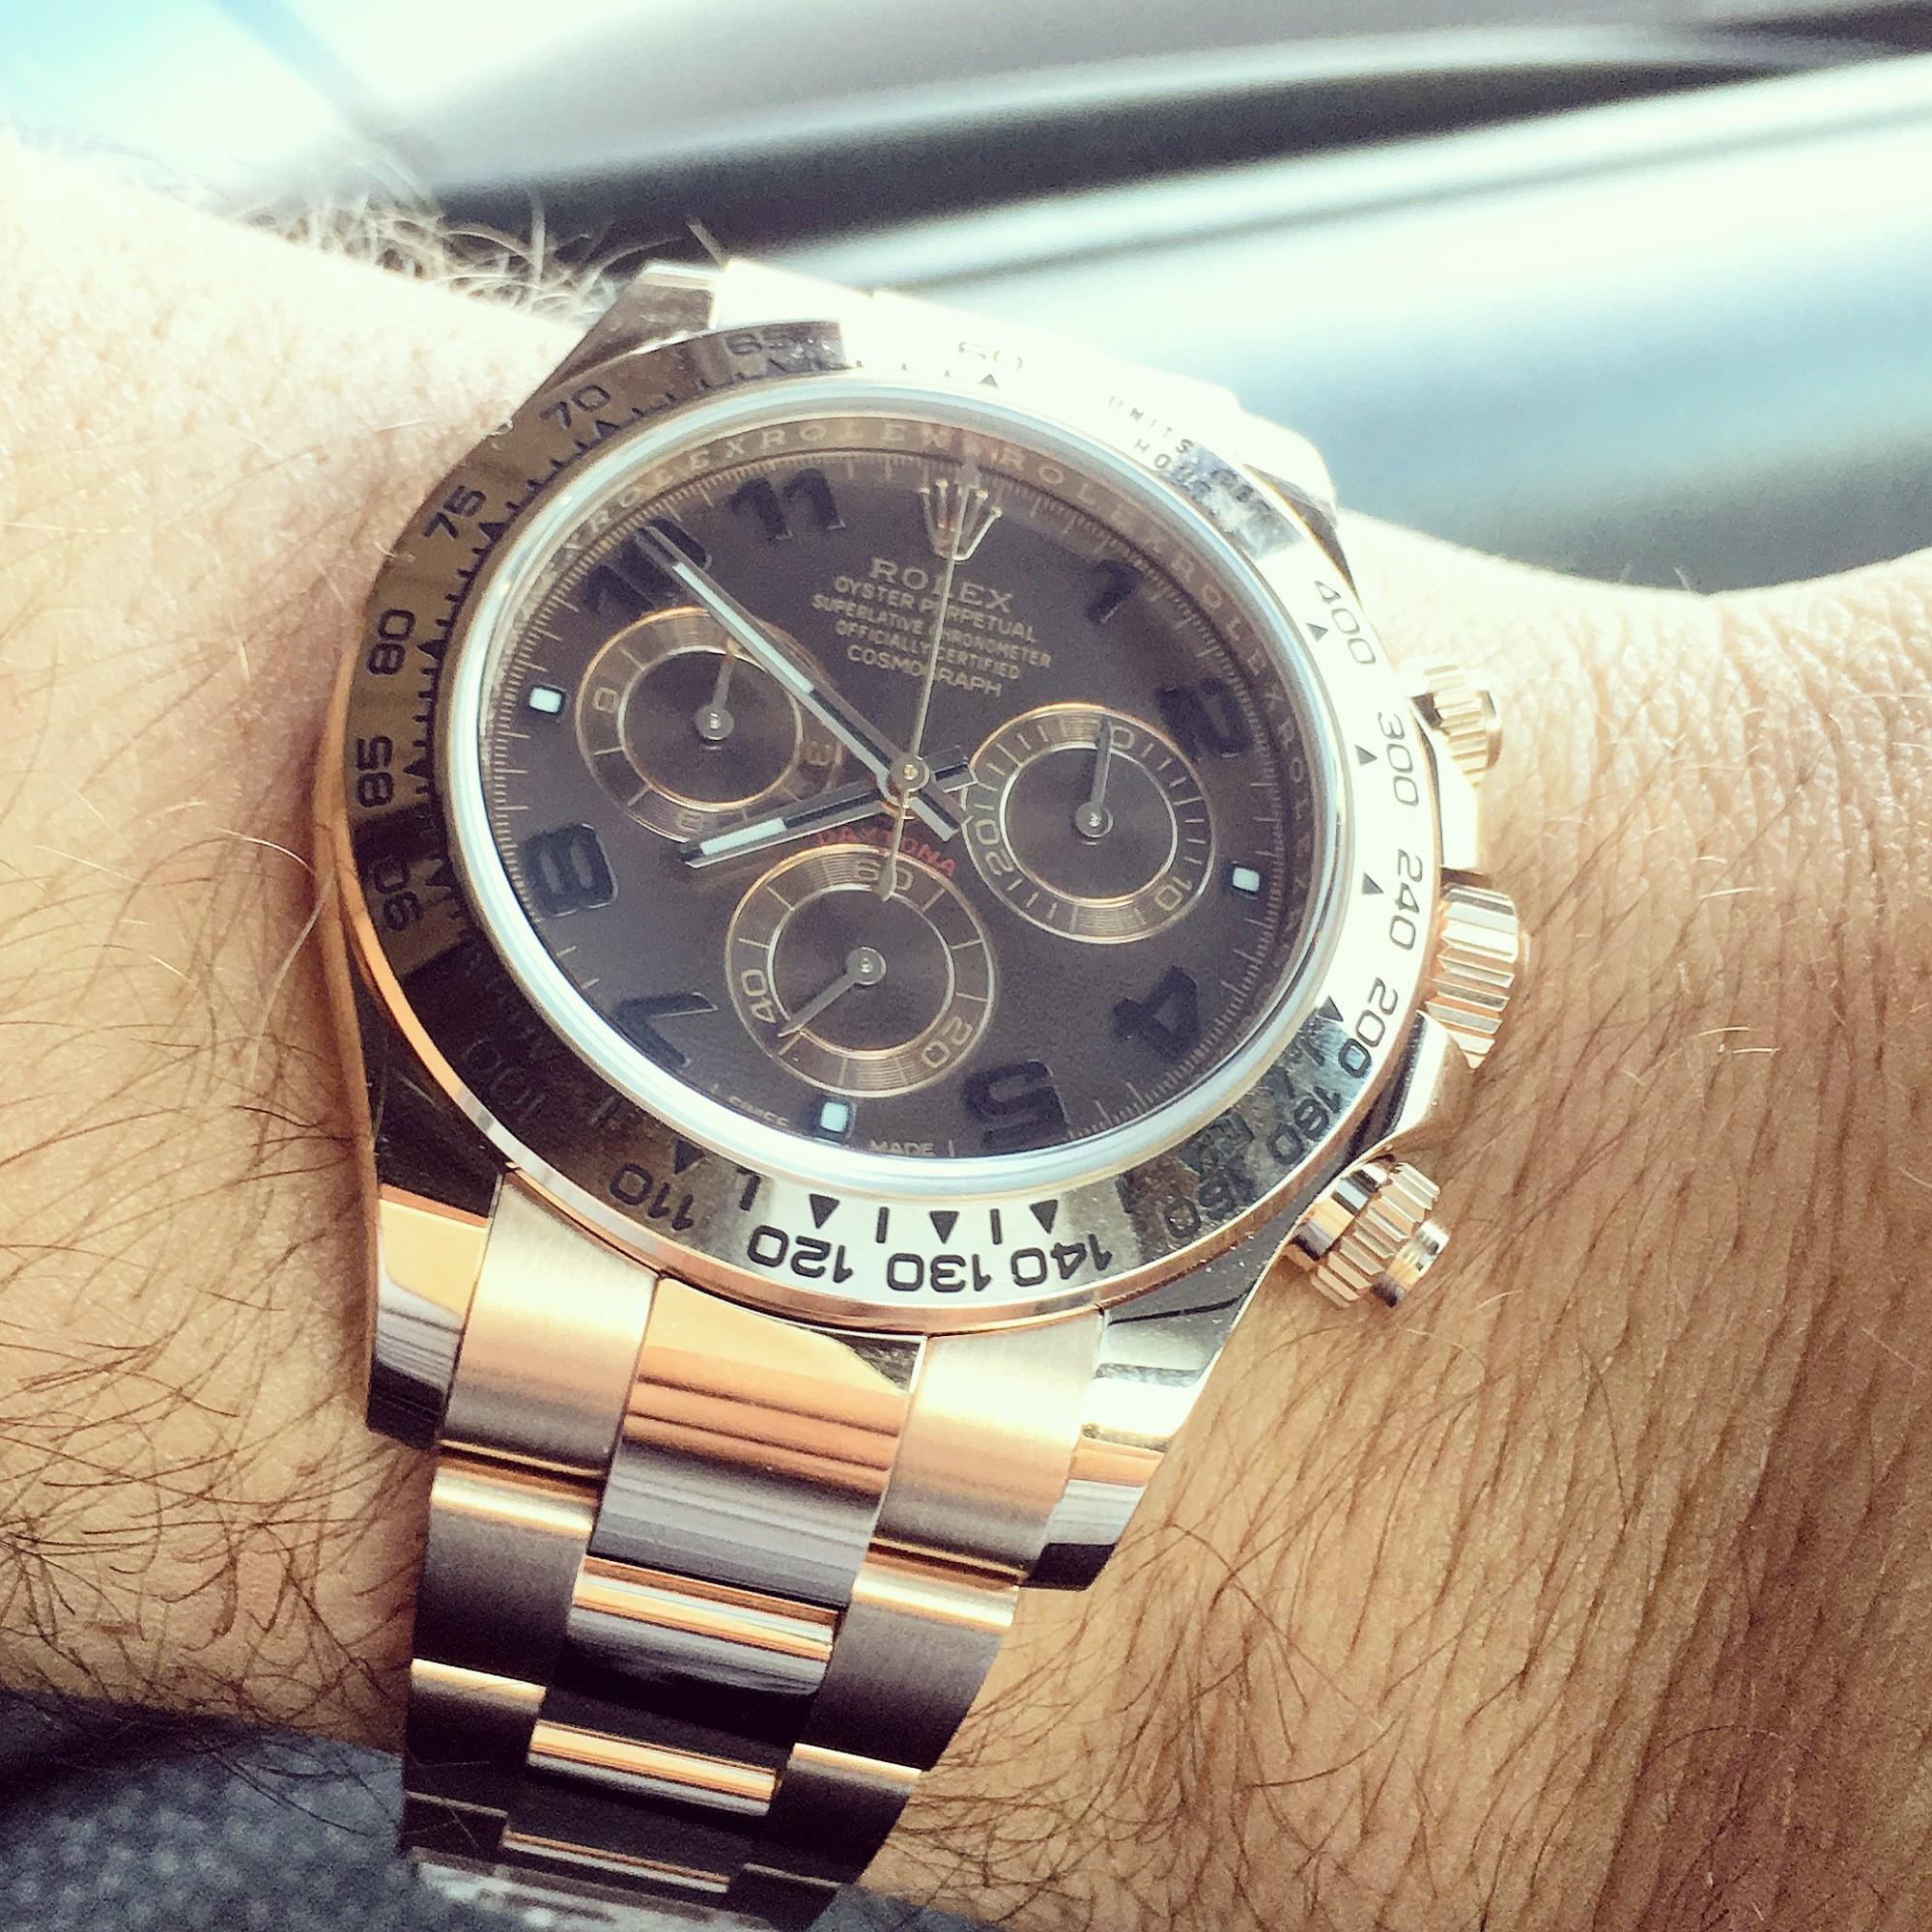 Montre occasion Rolex Daytona 116505.